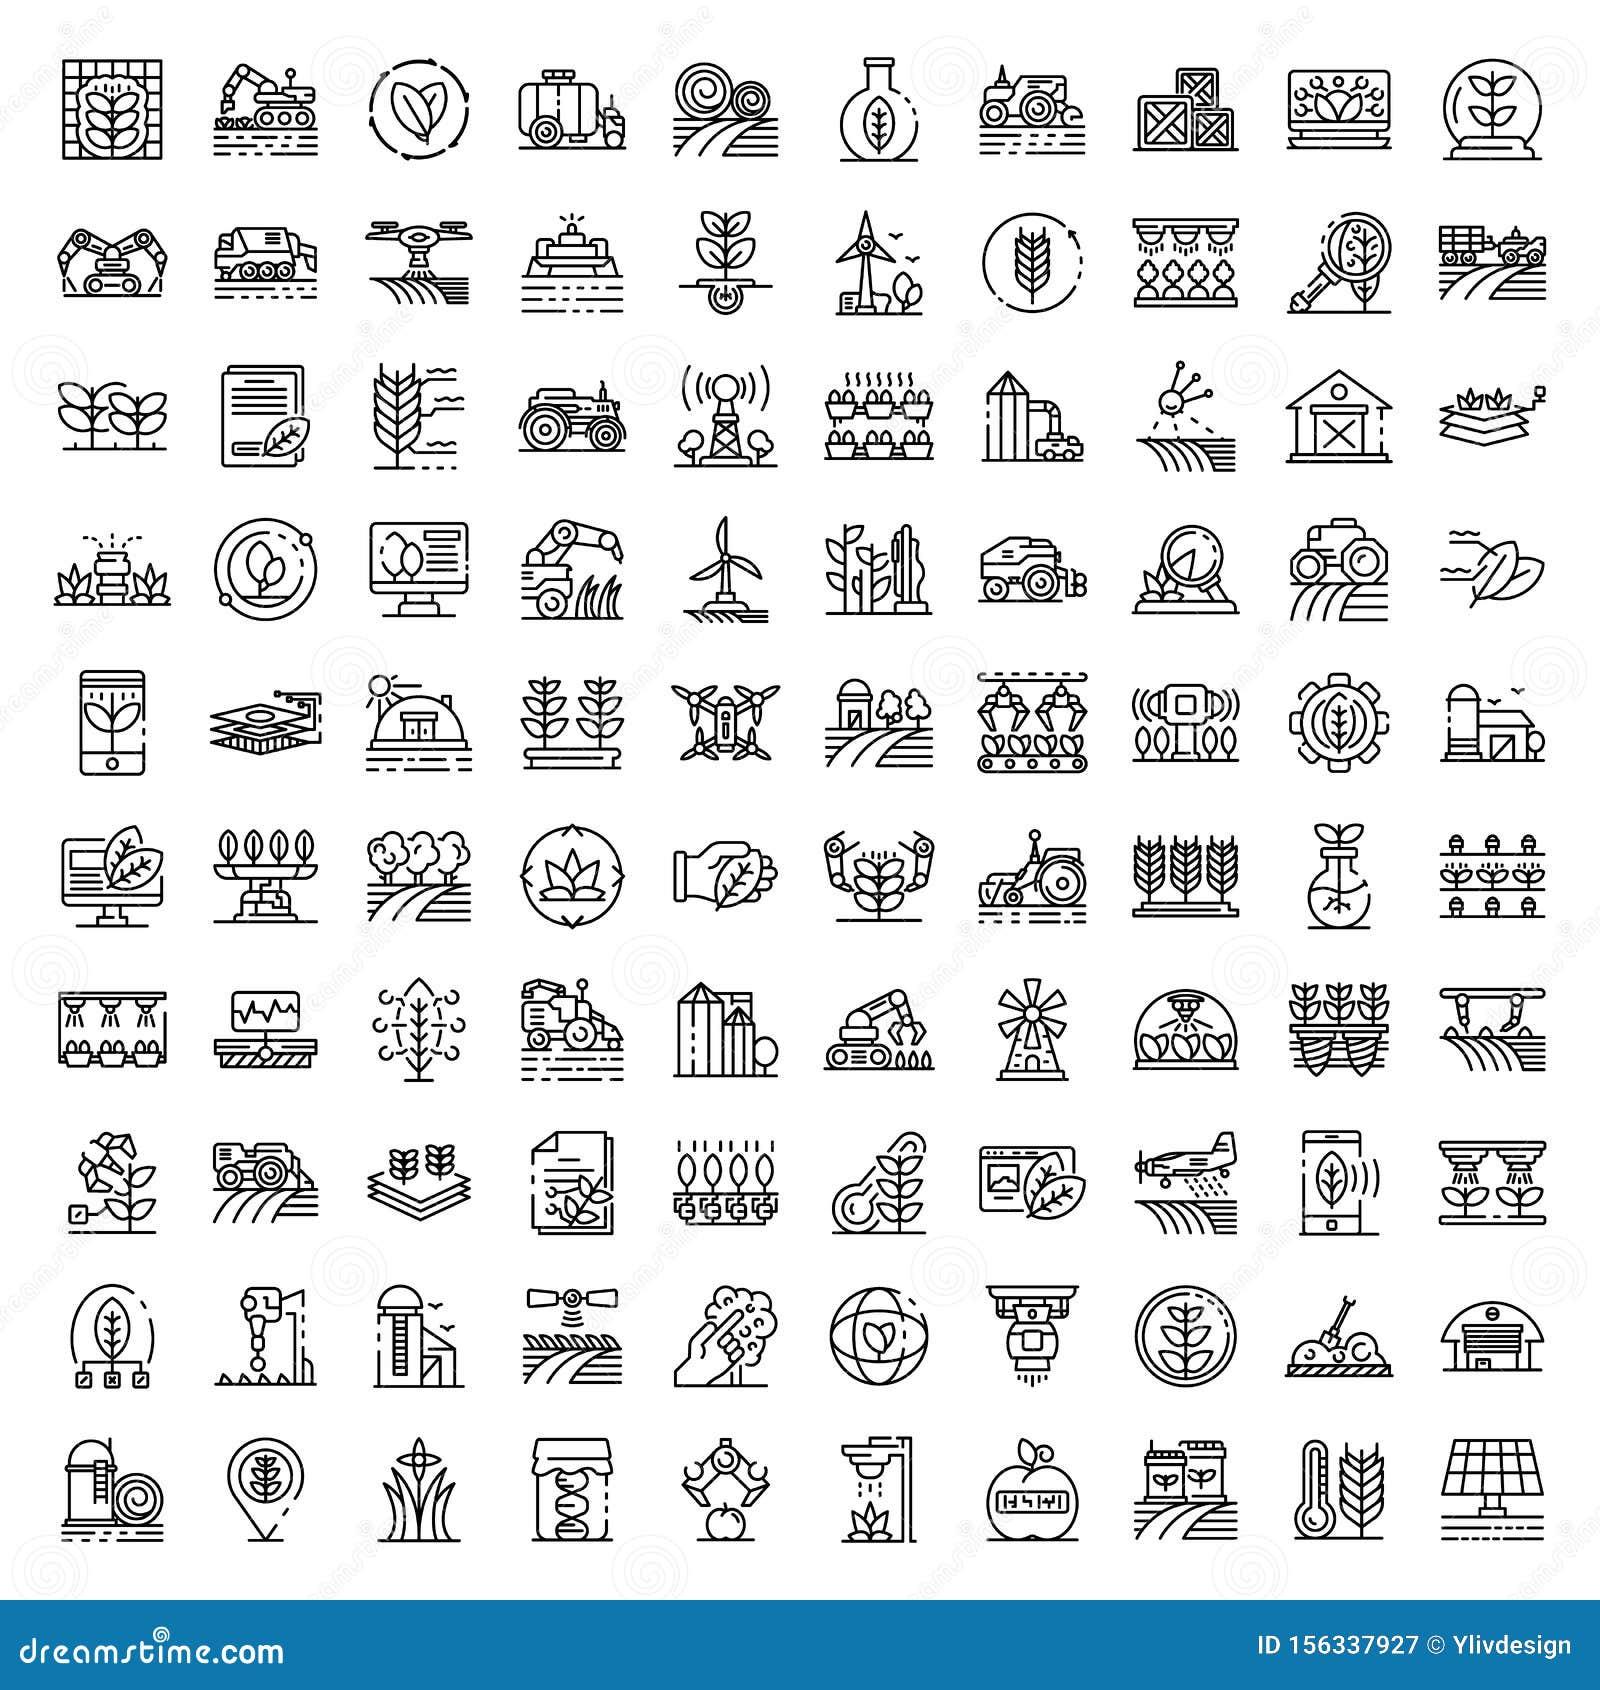 Farming robot icons set, outline style